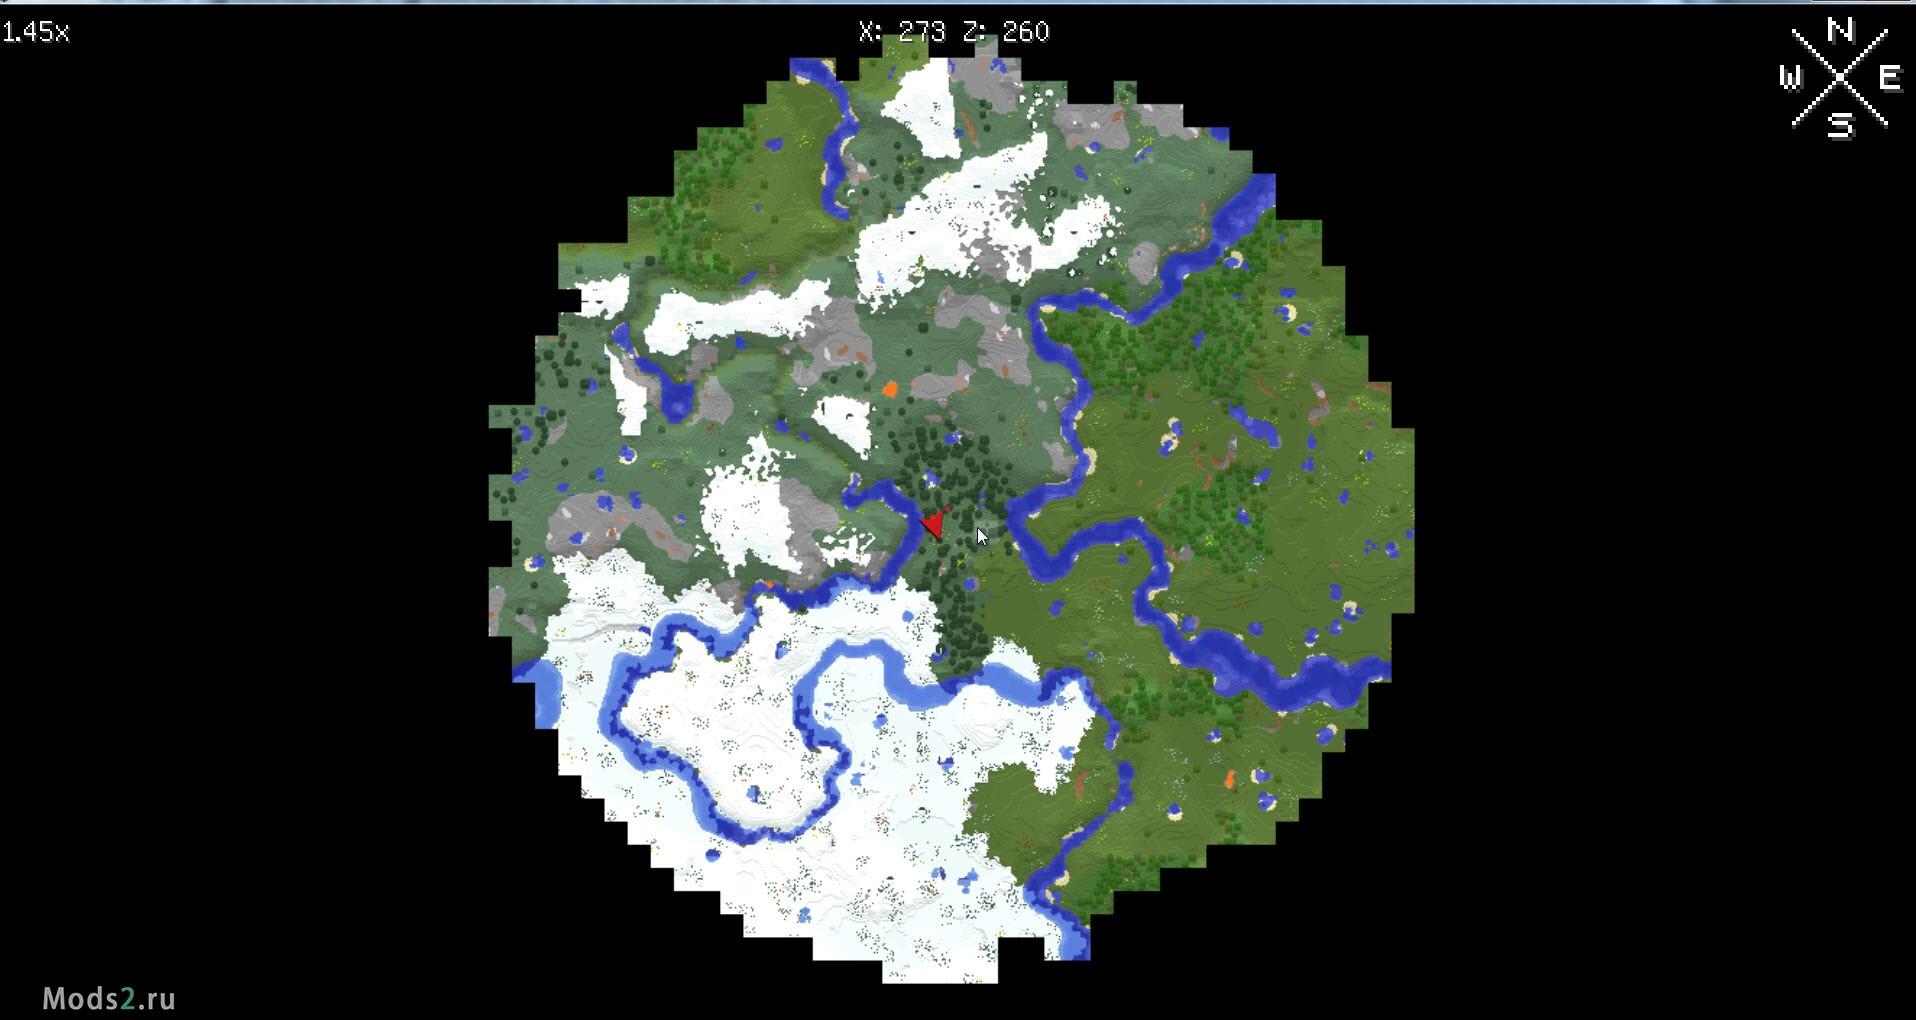 Karta Mira Xaero S World Map 1 13 2 1 12 2 1 11 2 1 10 2 1 8 9 1 7